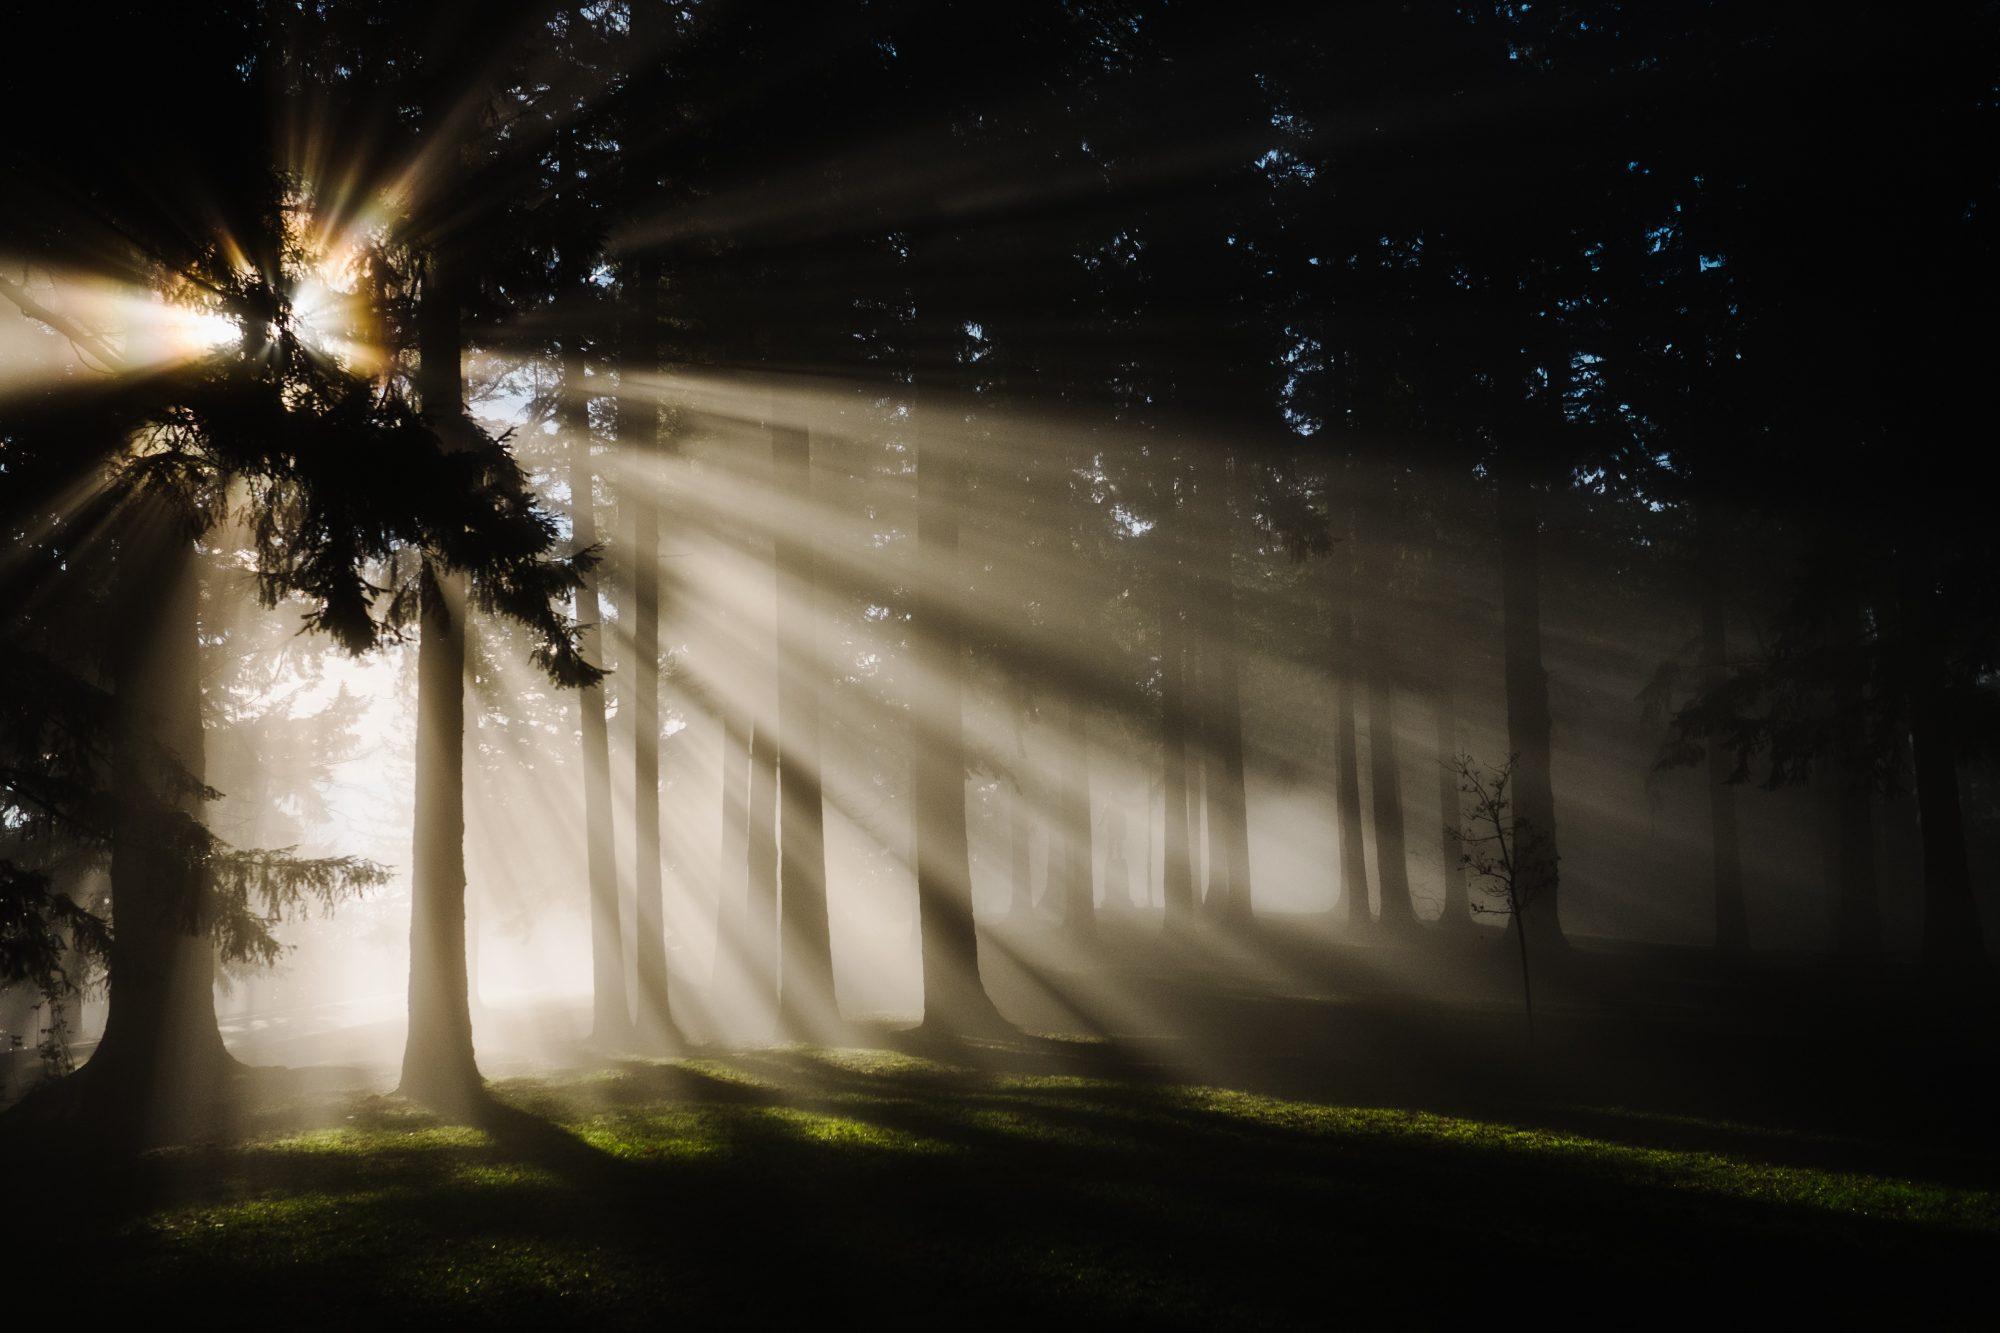 10 Gründe zur Hoffnung (wenn alles hoffnungslos erscheint)